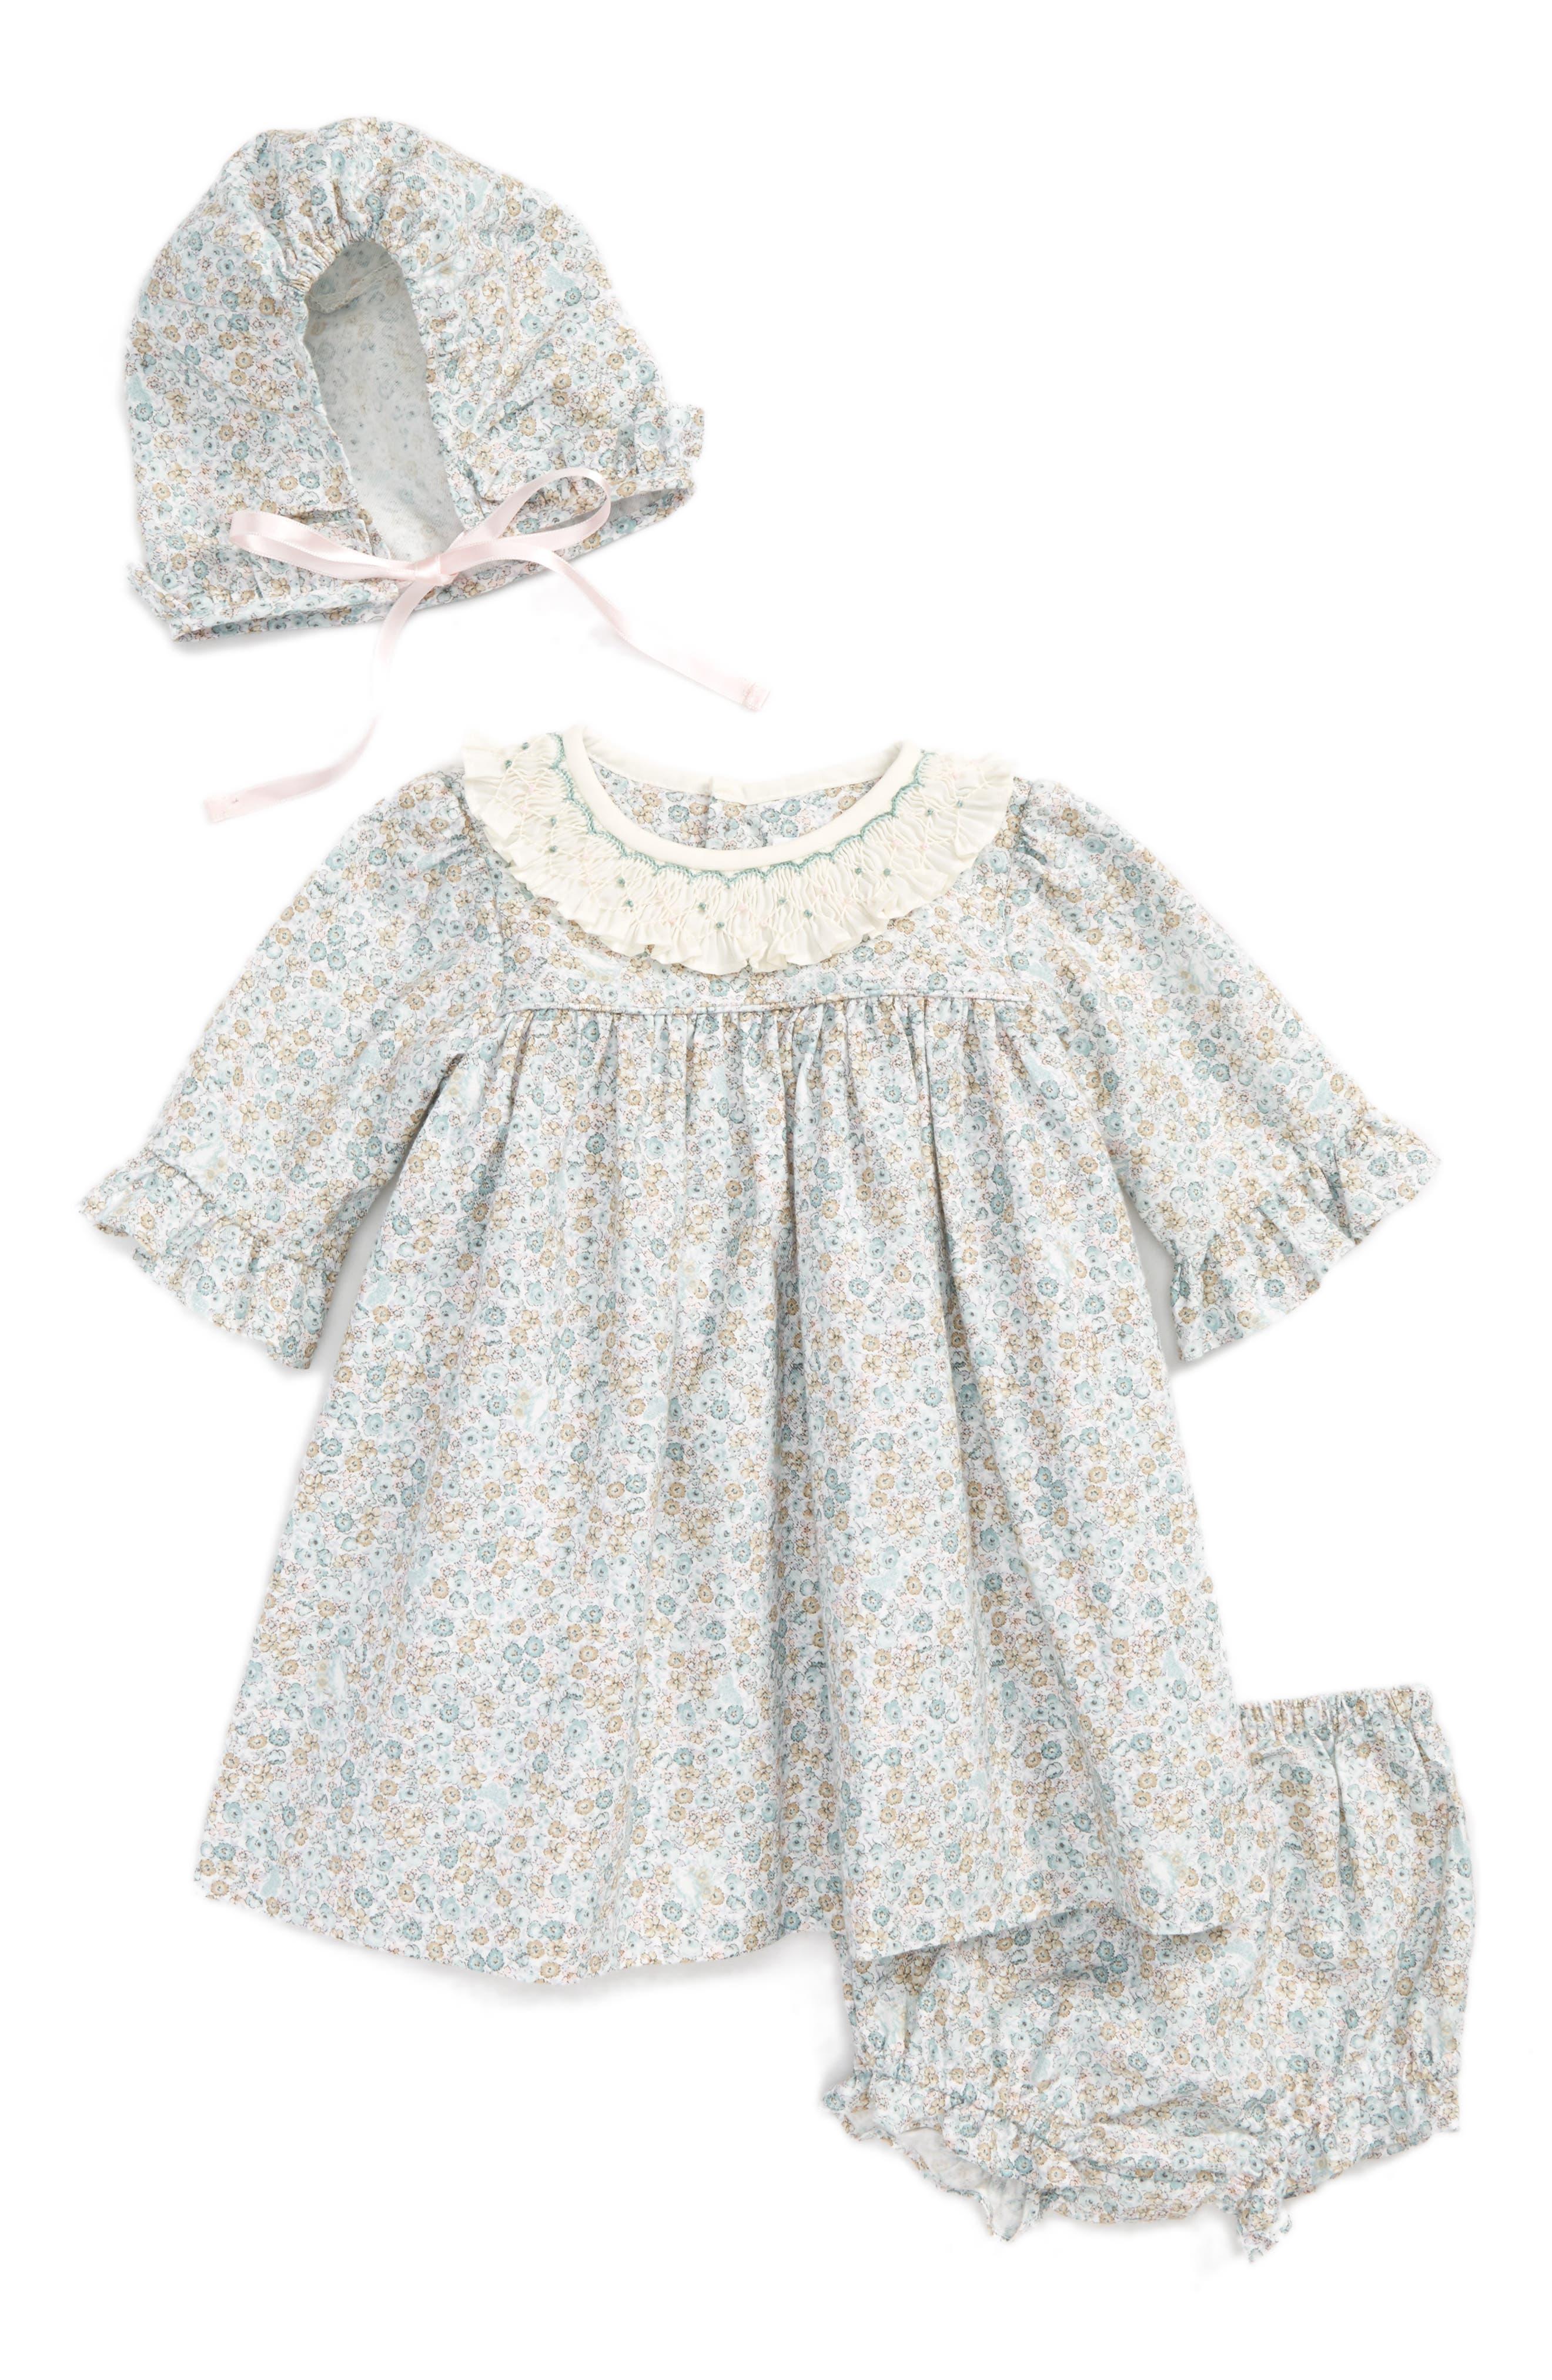 Luli & Me Dress, Hat & Bloomers Set (Baby Girls)